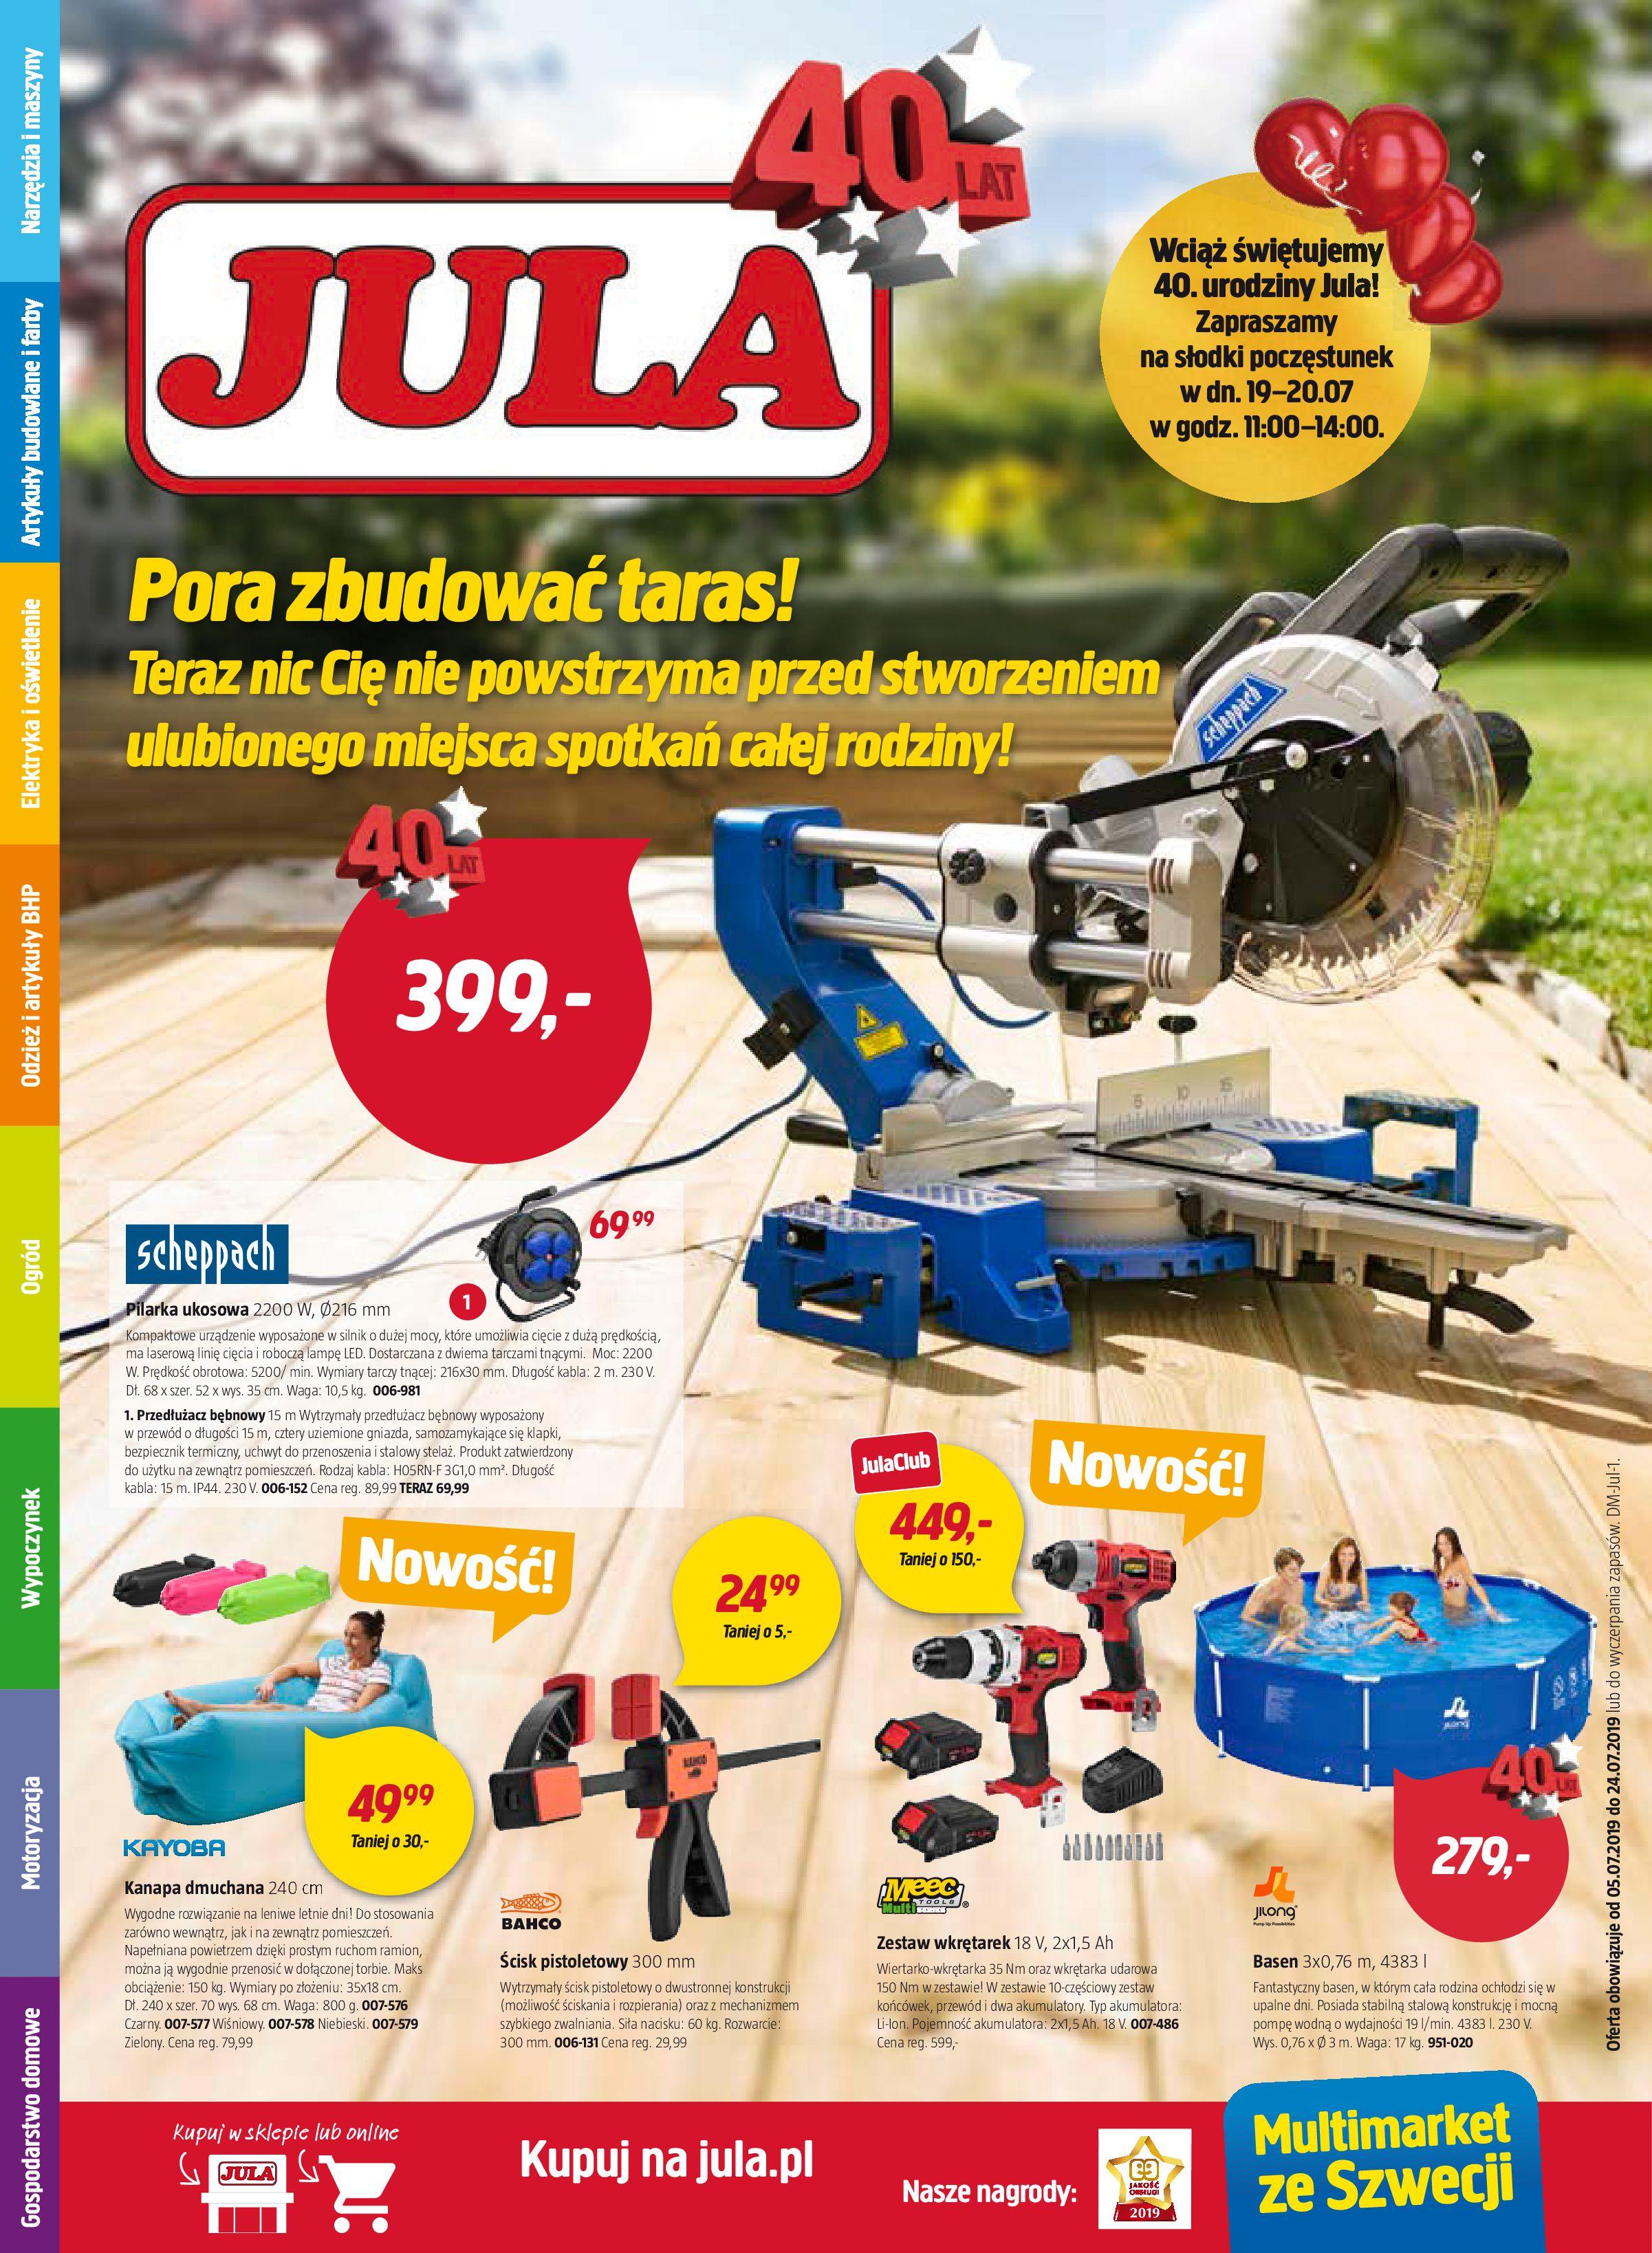 Gazetka Jula - Oferta na art. budowlane-04.07.2019-24.07.2019-page-